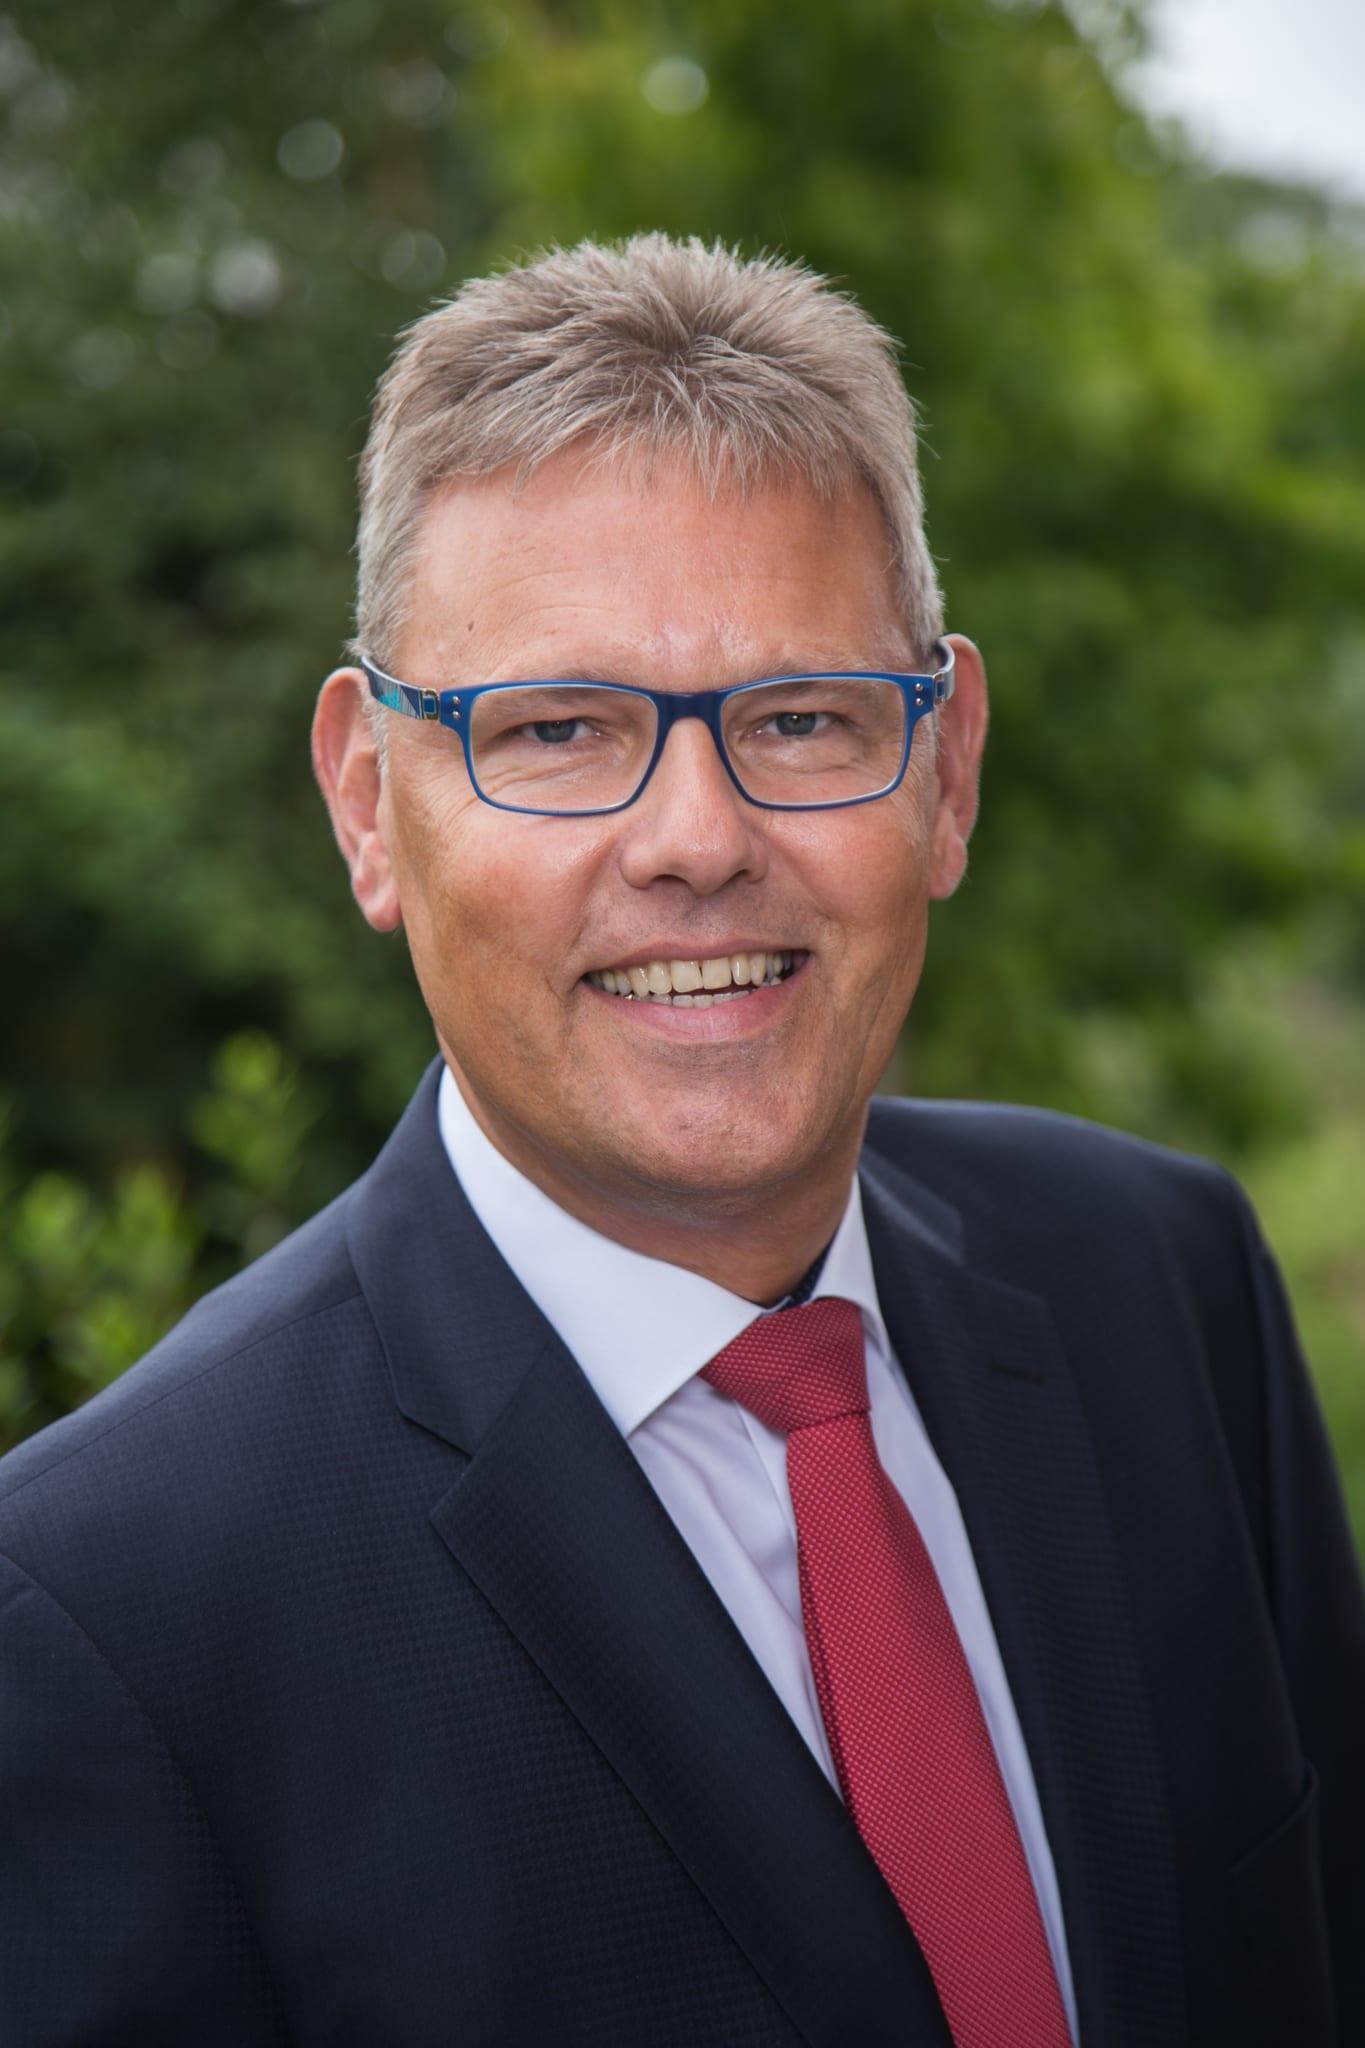 Markus Kampling